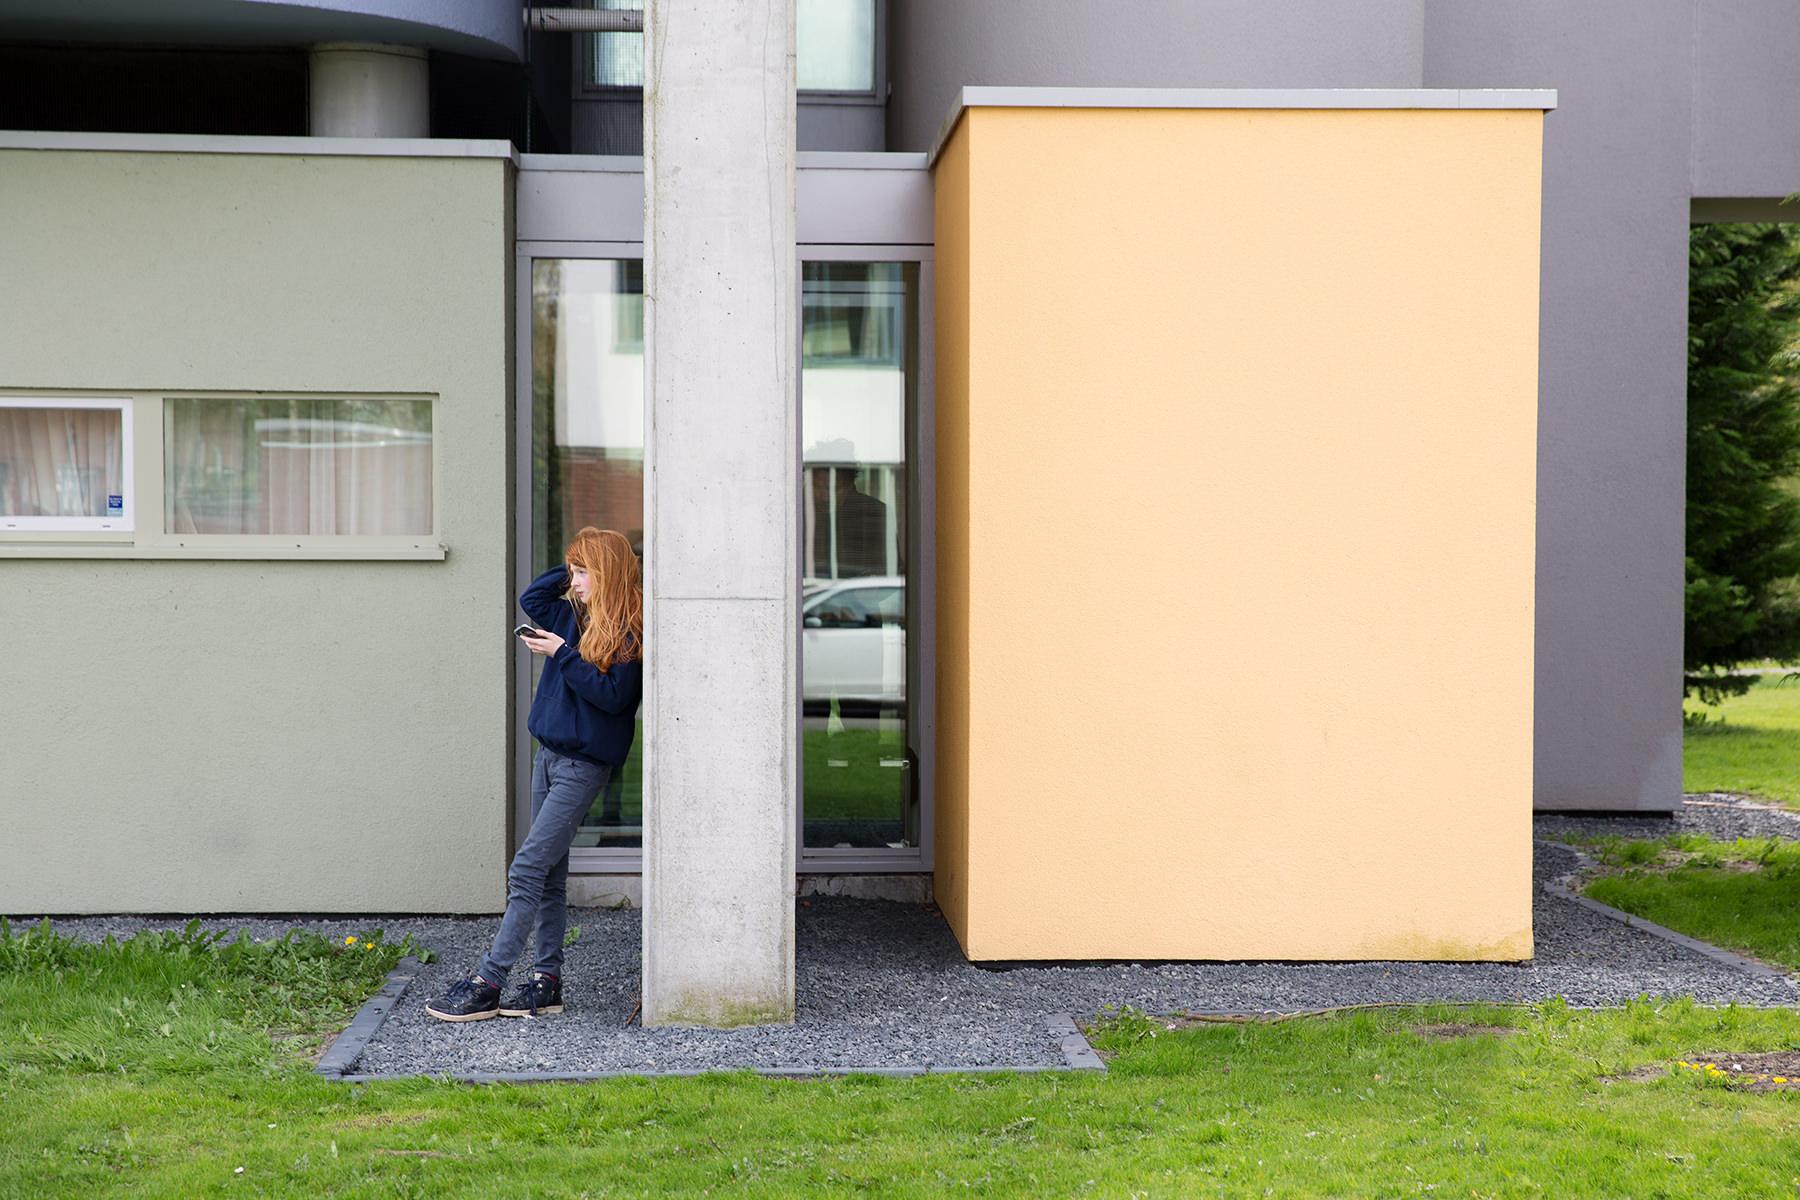 Fotograaf Groningen - Wall House #2 Seizoensopening in opdracht Groninger Museum